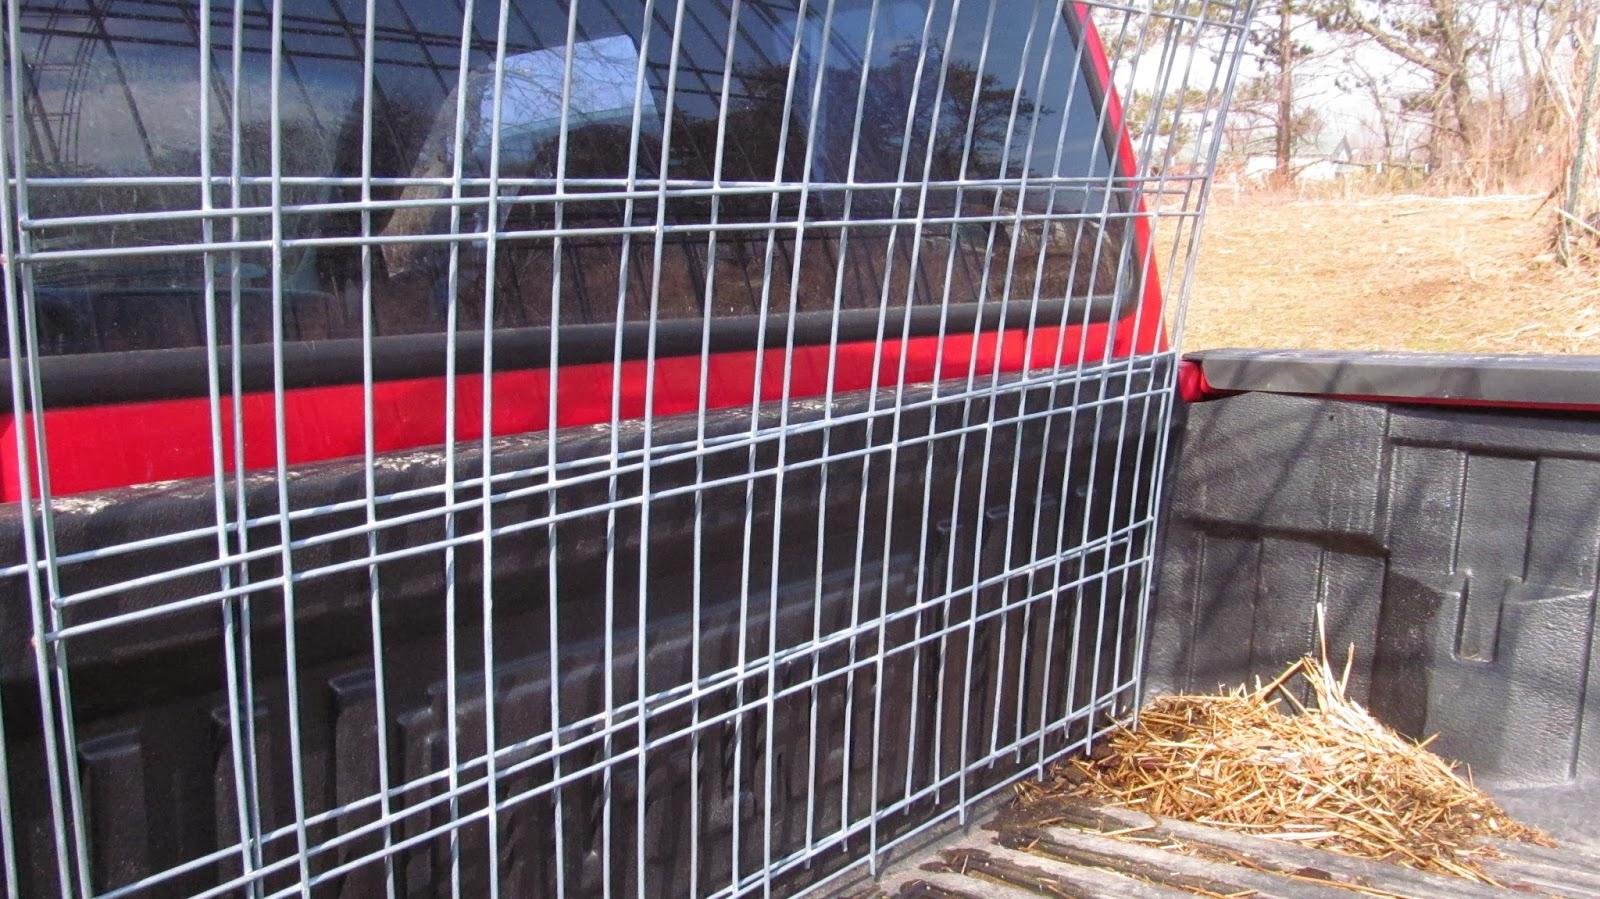 16 Ft Hog Wire Panels - WIRE Center •